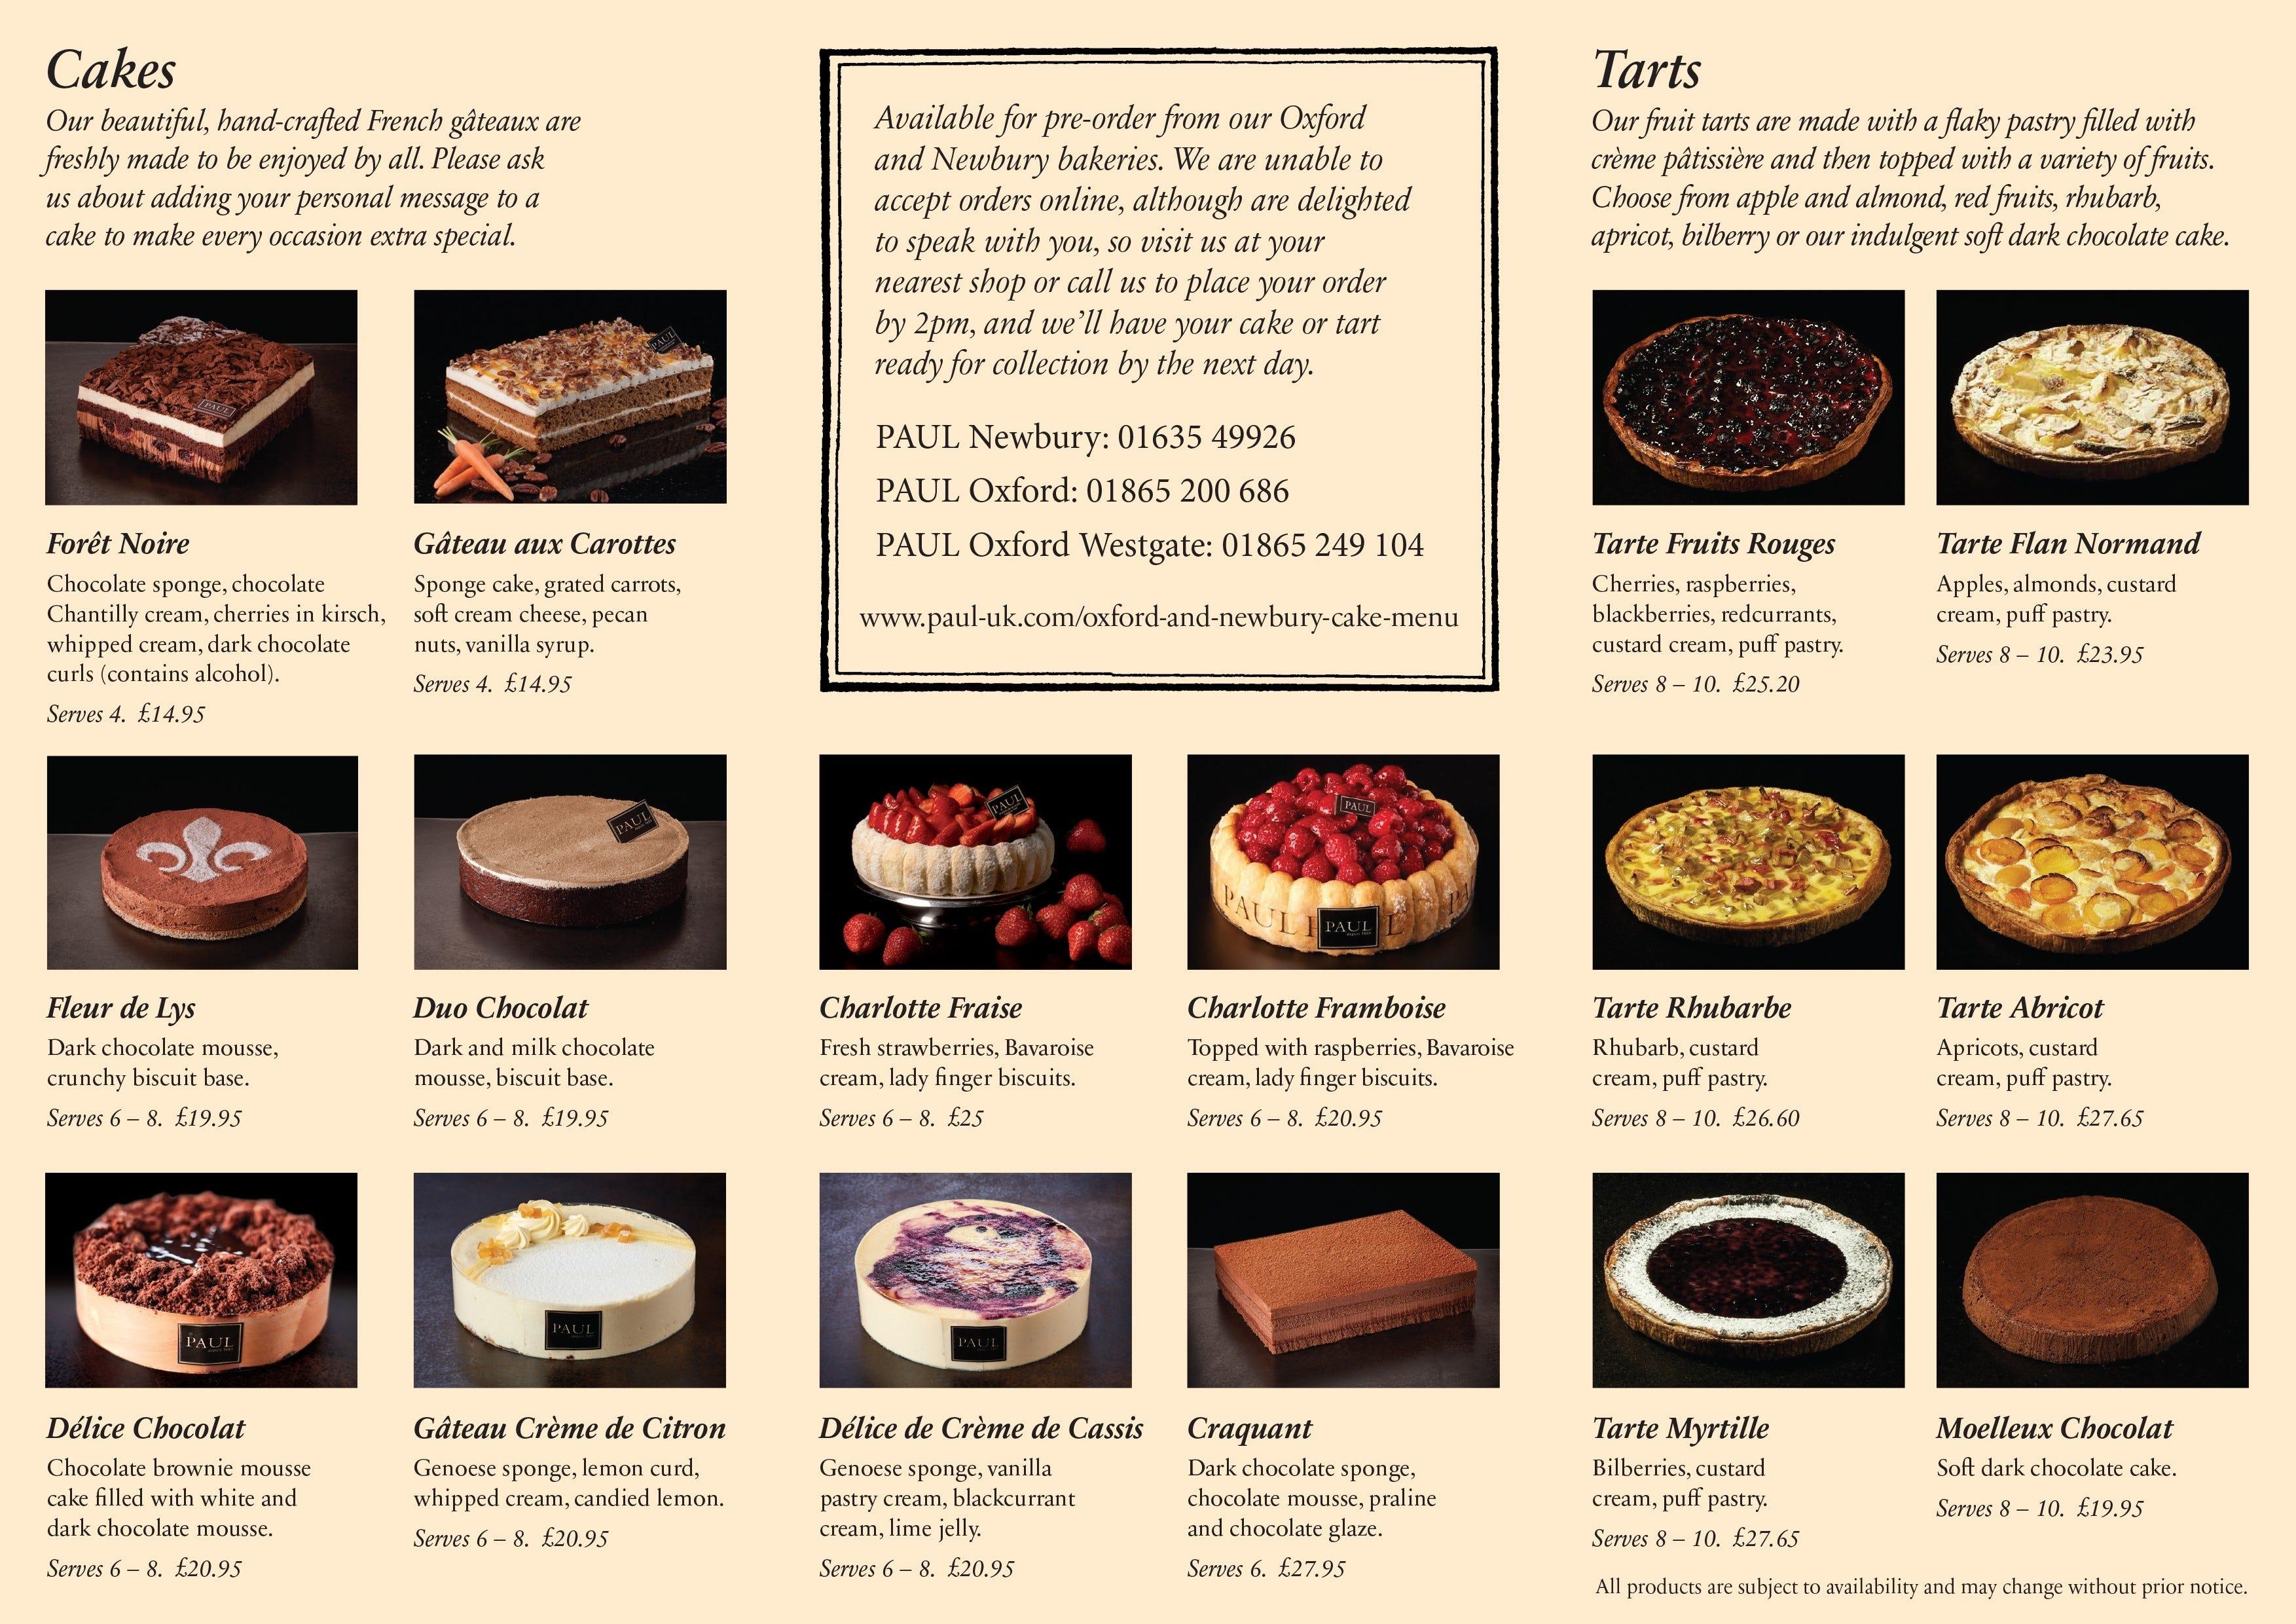 Oxford & Newbury Cake Menu